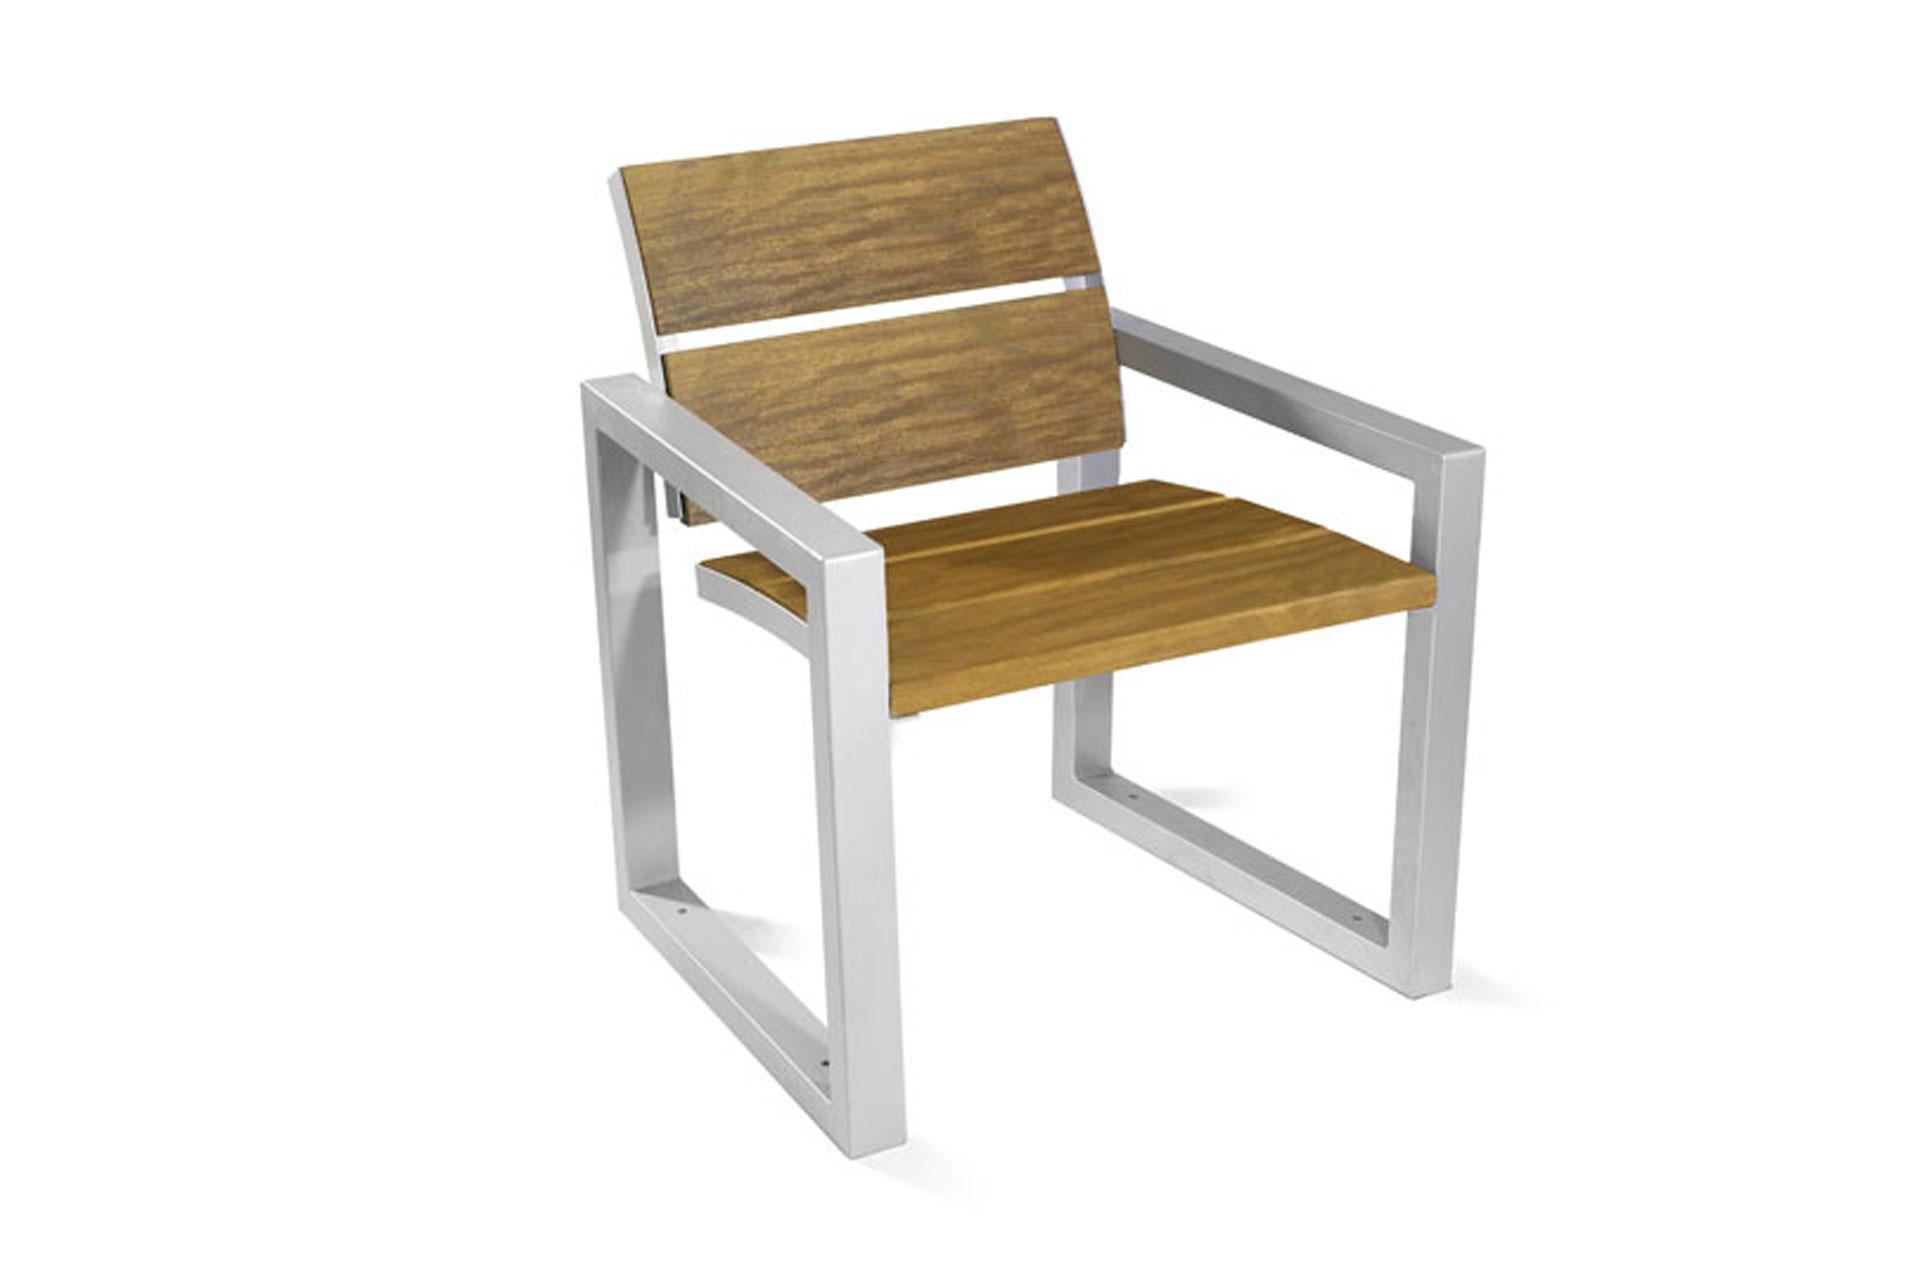 UrbanObjekts Lyra Sitzgelegenheit